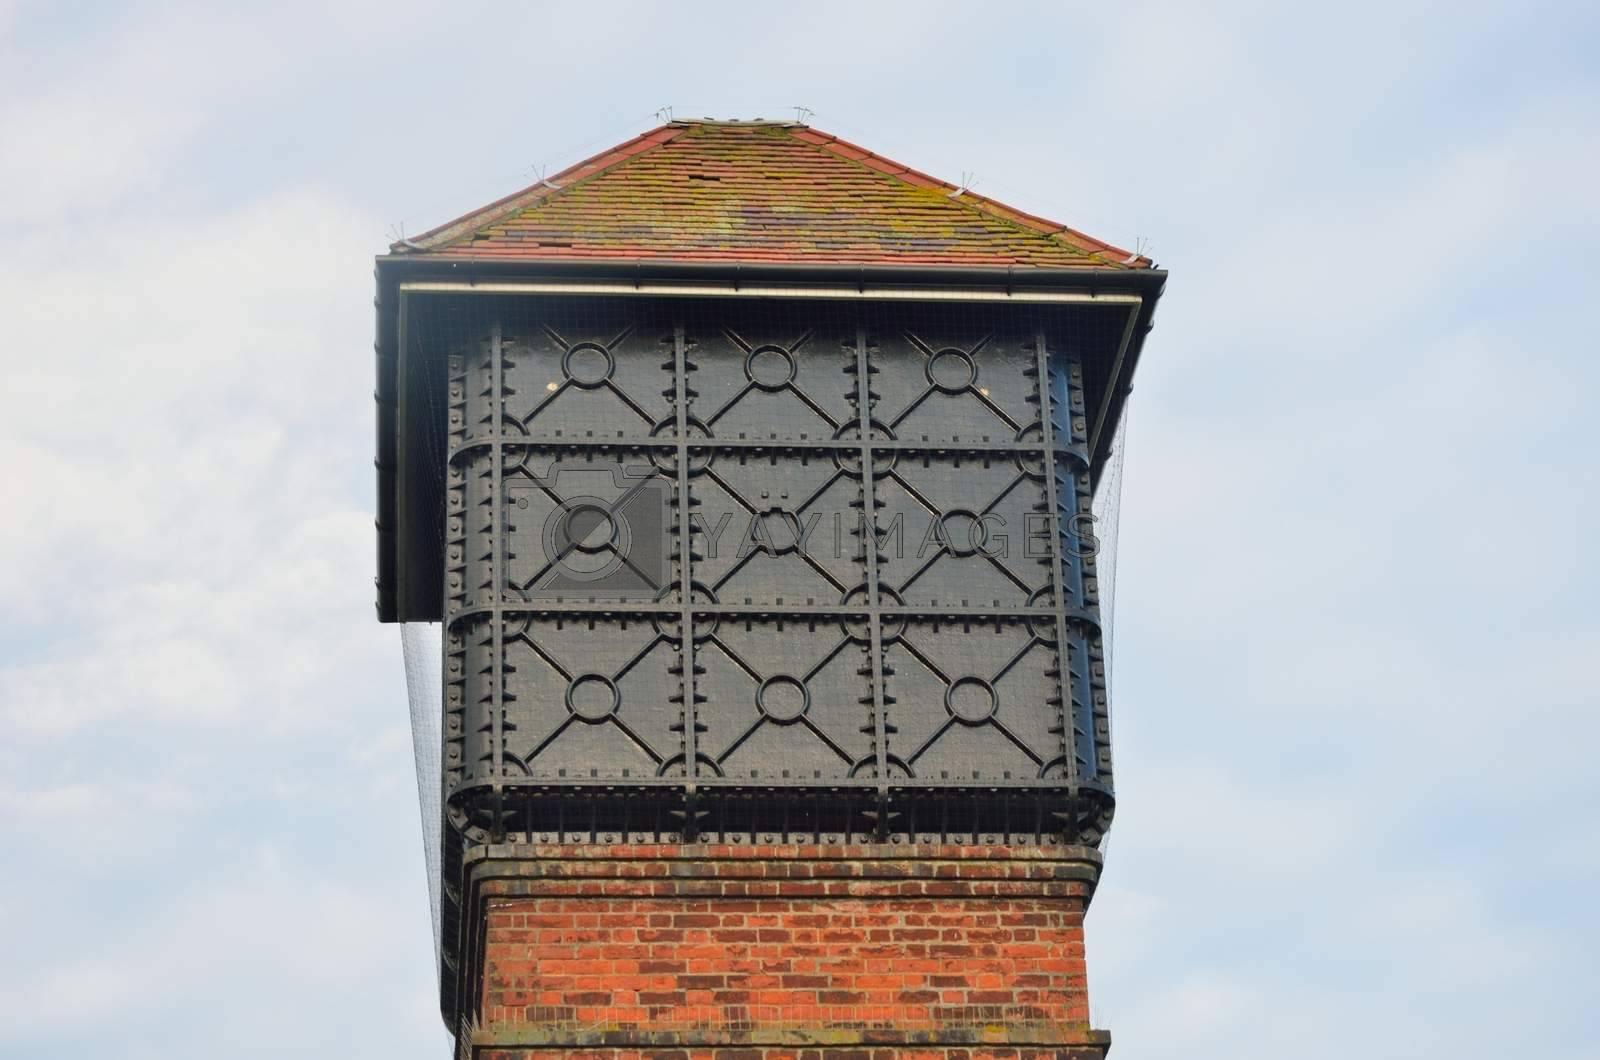 Top of Brick Water Tower